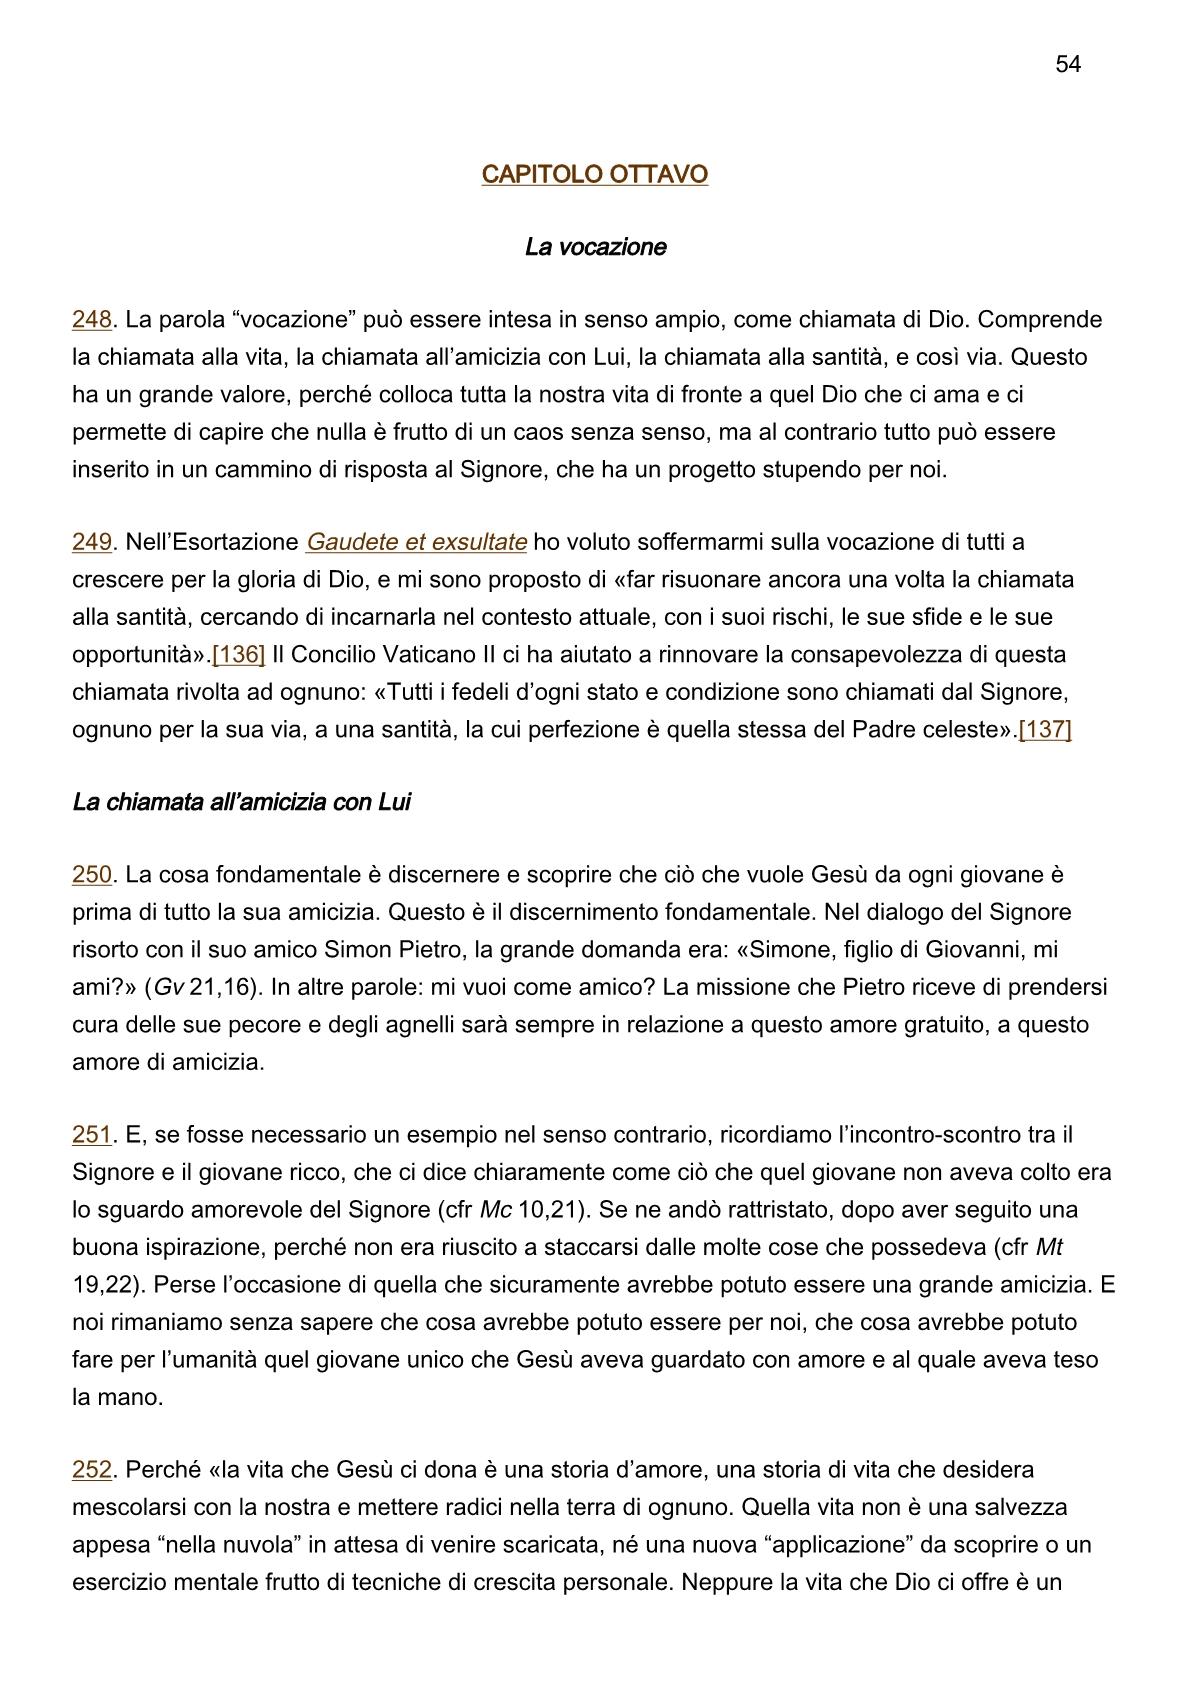 papa-francesco_esortazione-ap_20190325_christus-vivit54